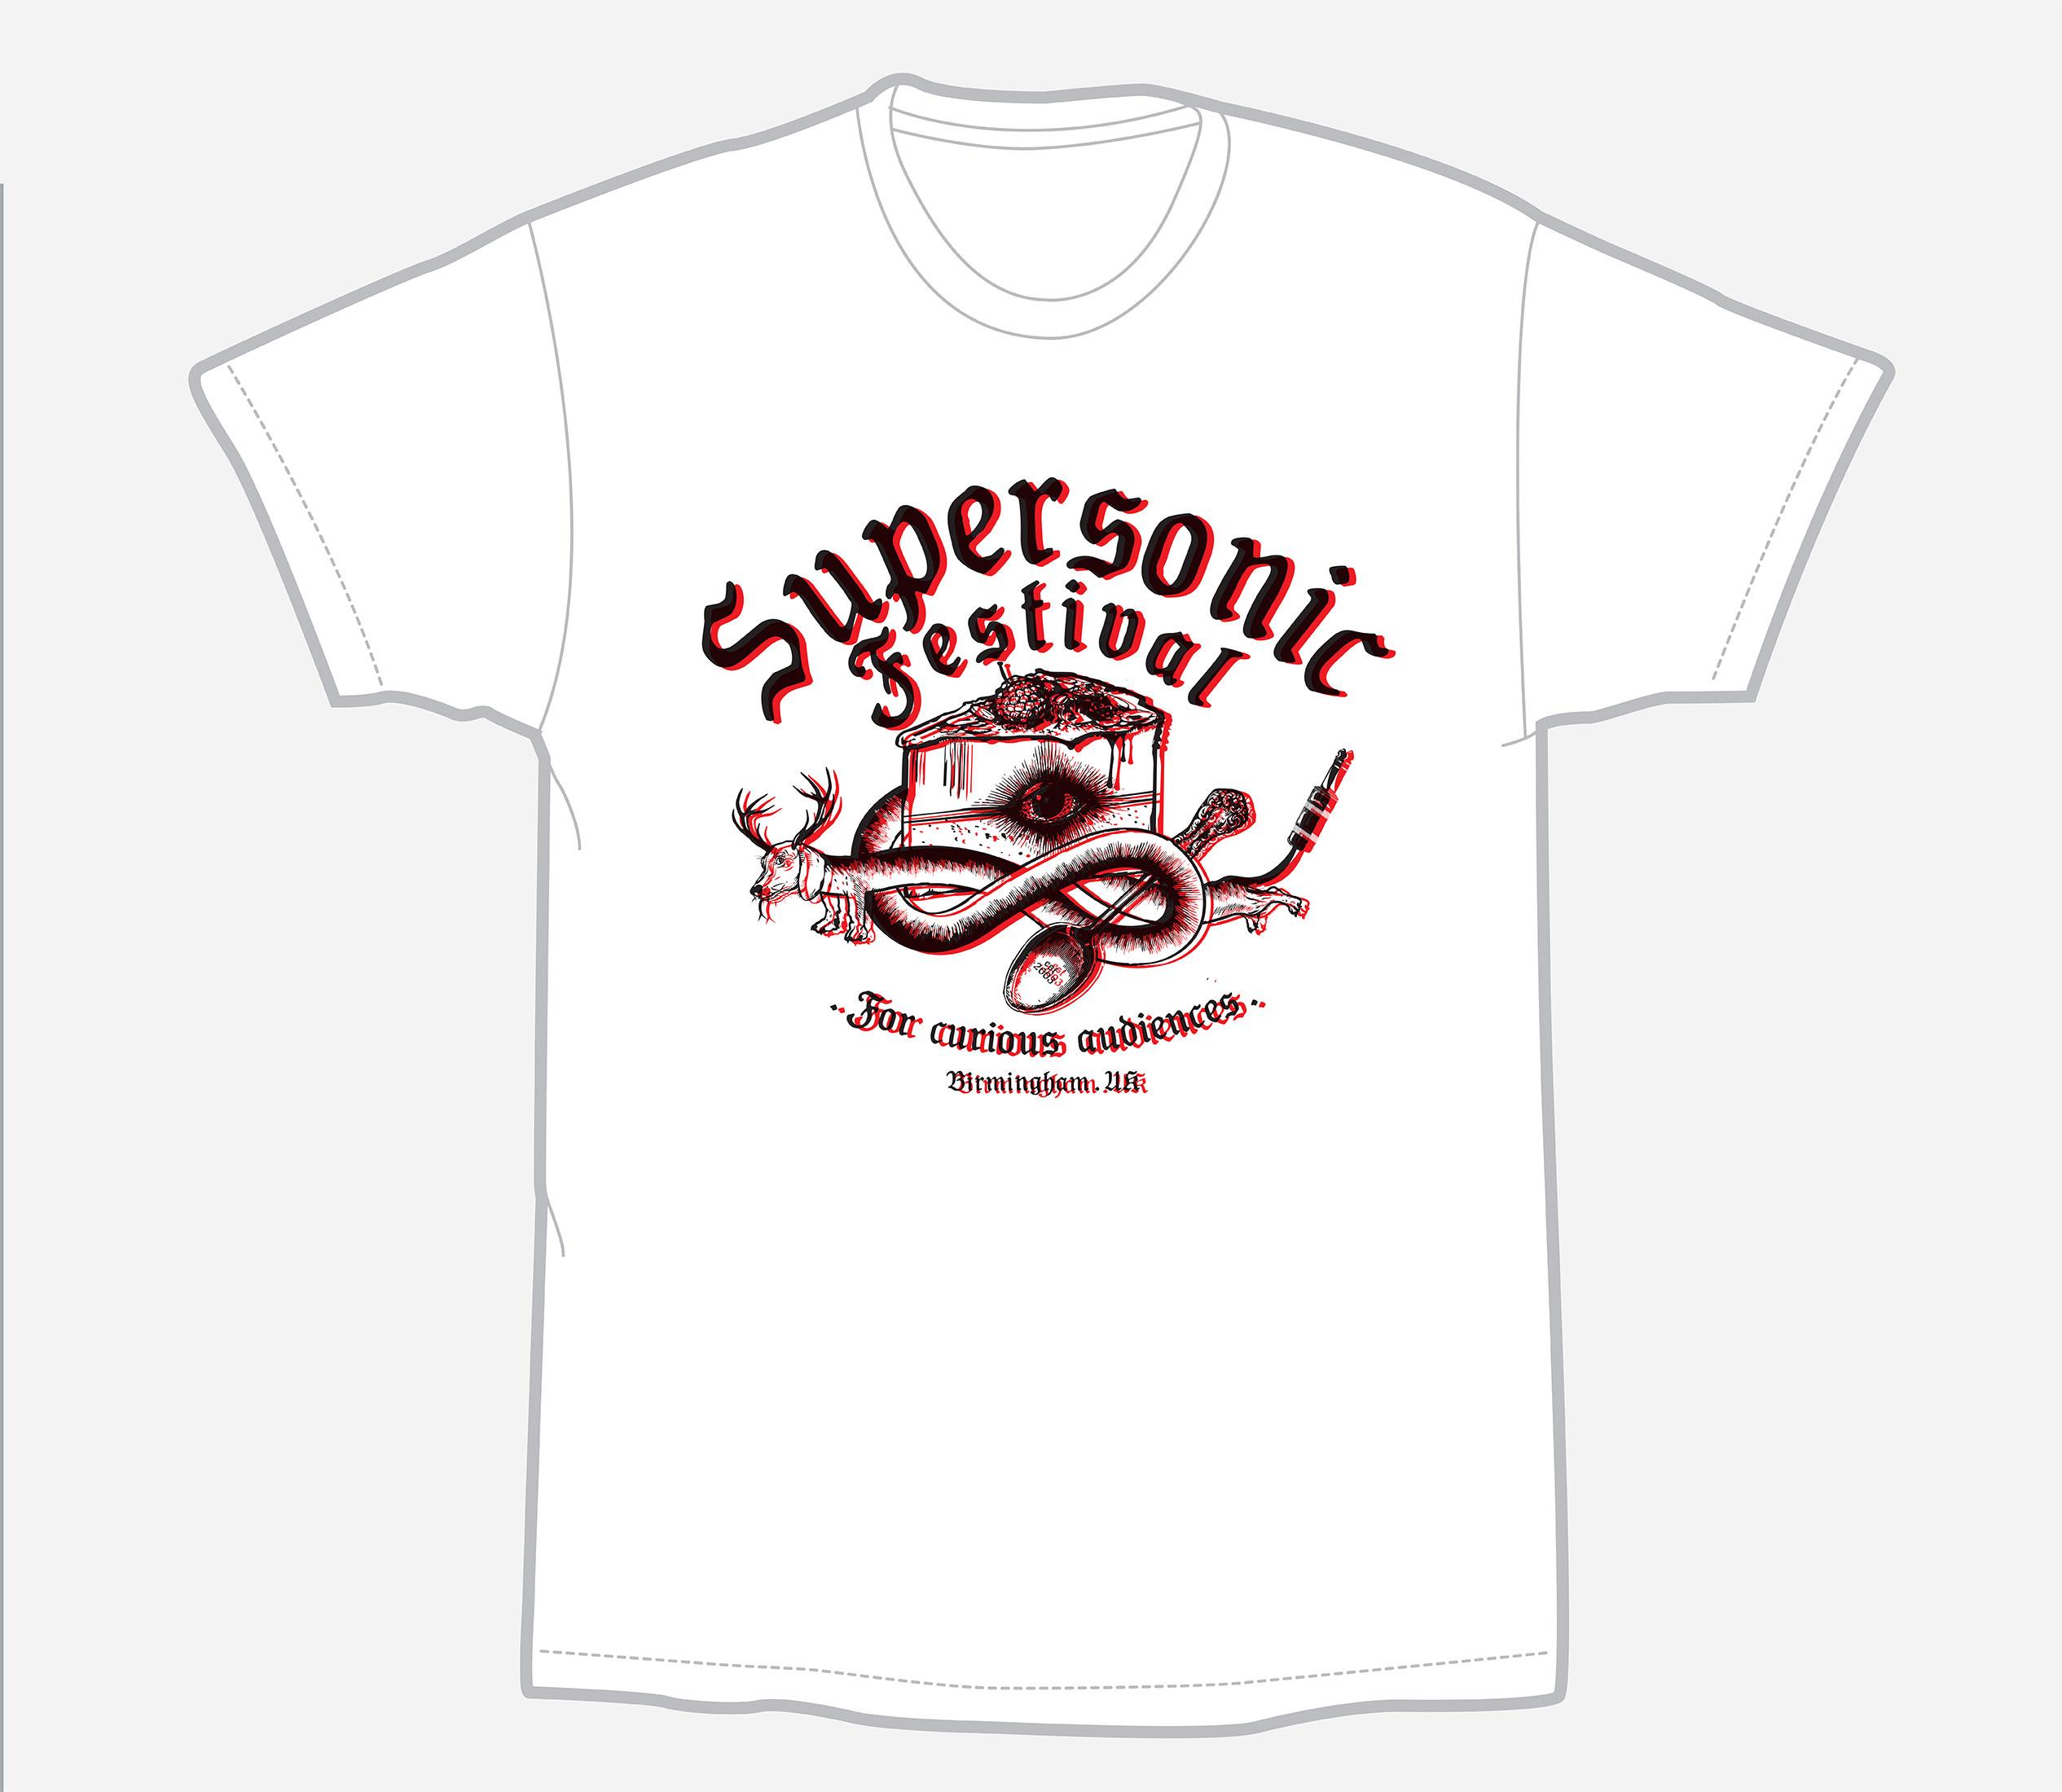 Supersonic Festival logo T